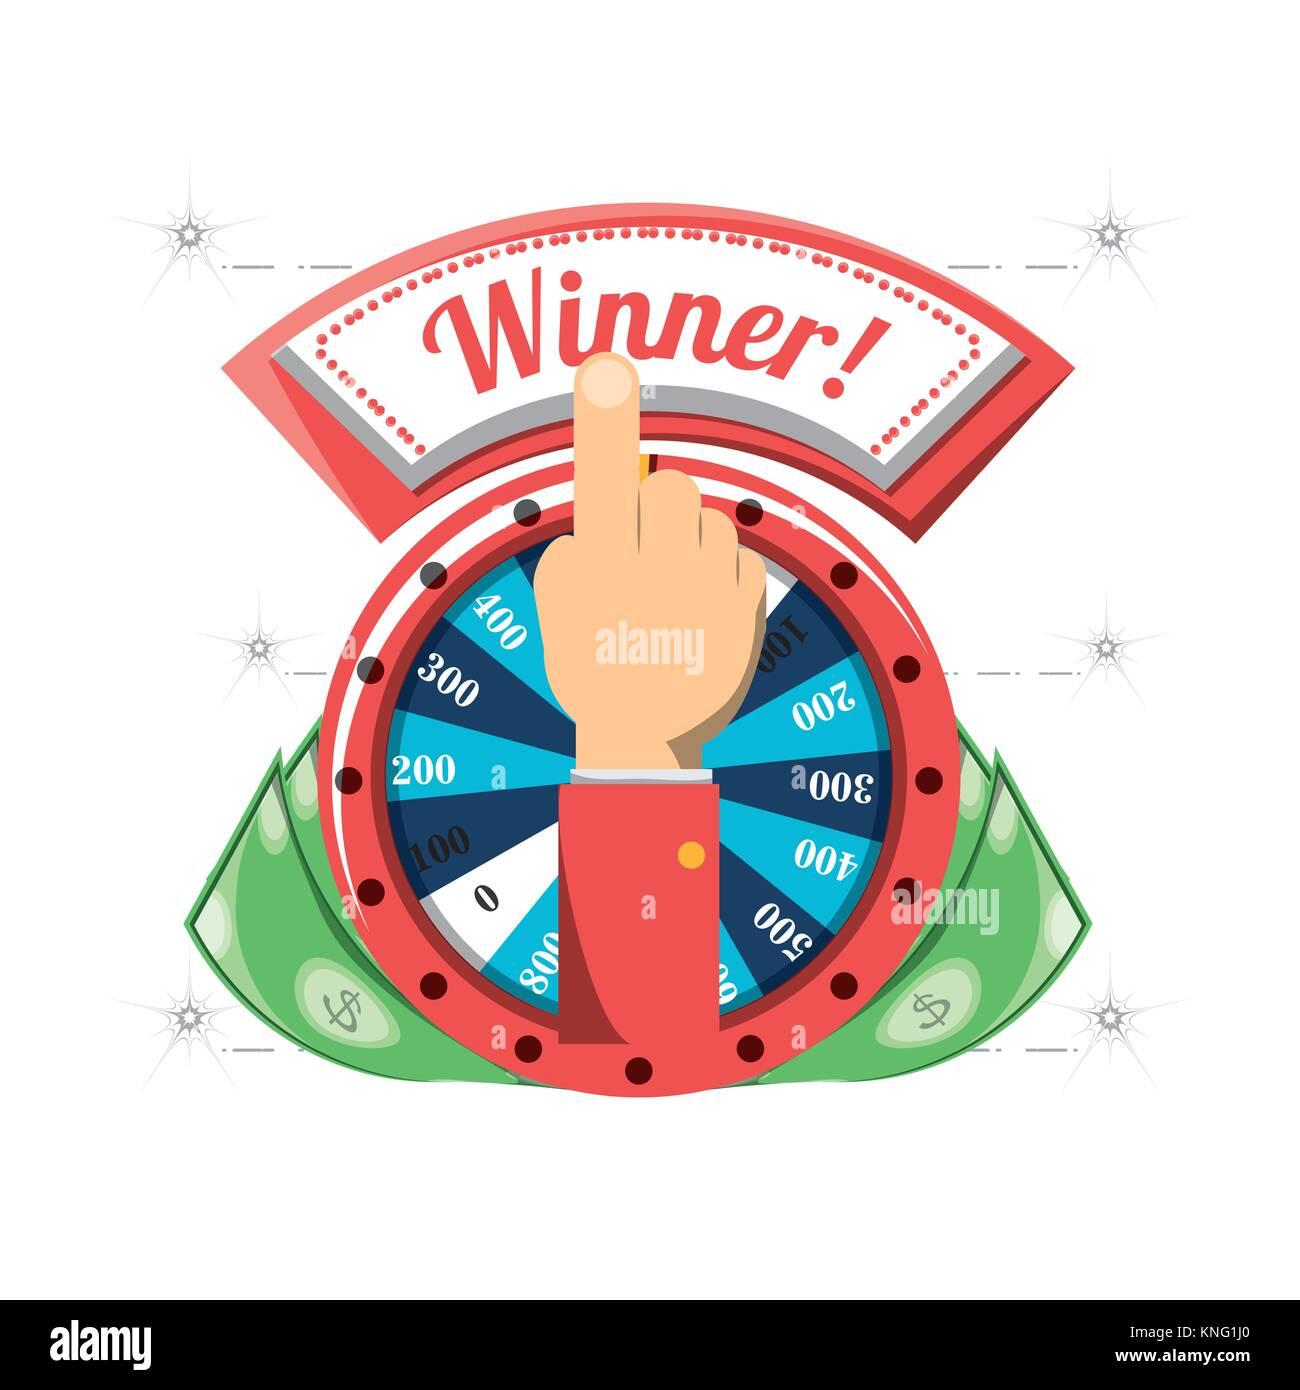 fortune wheel design - Stock Image